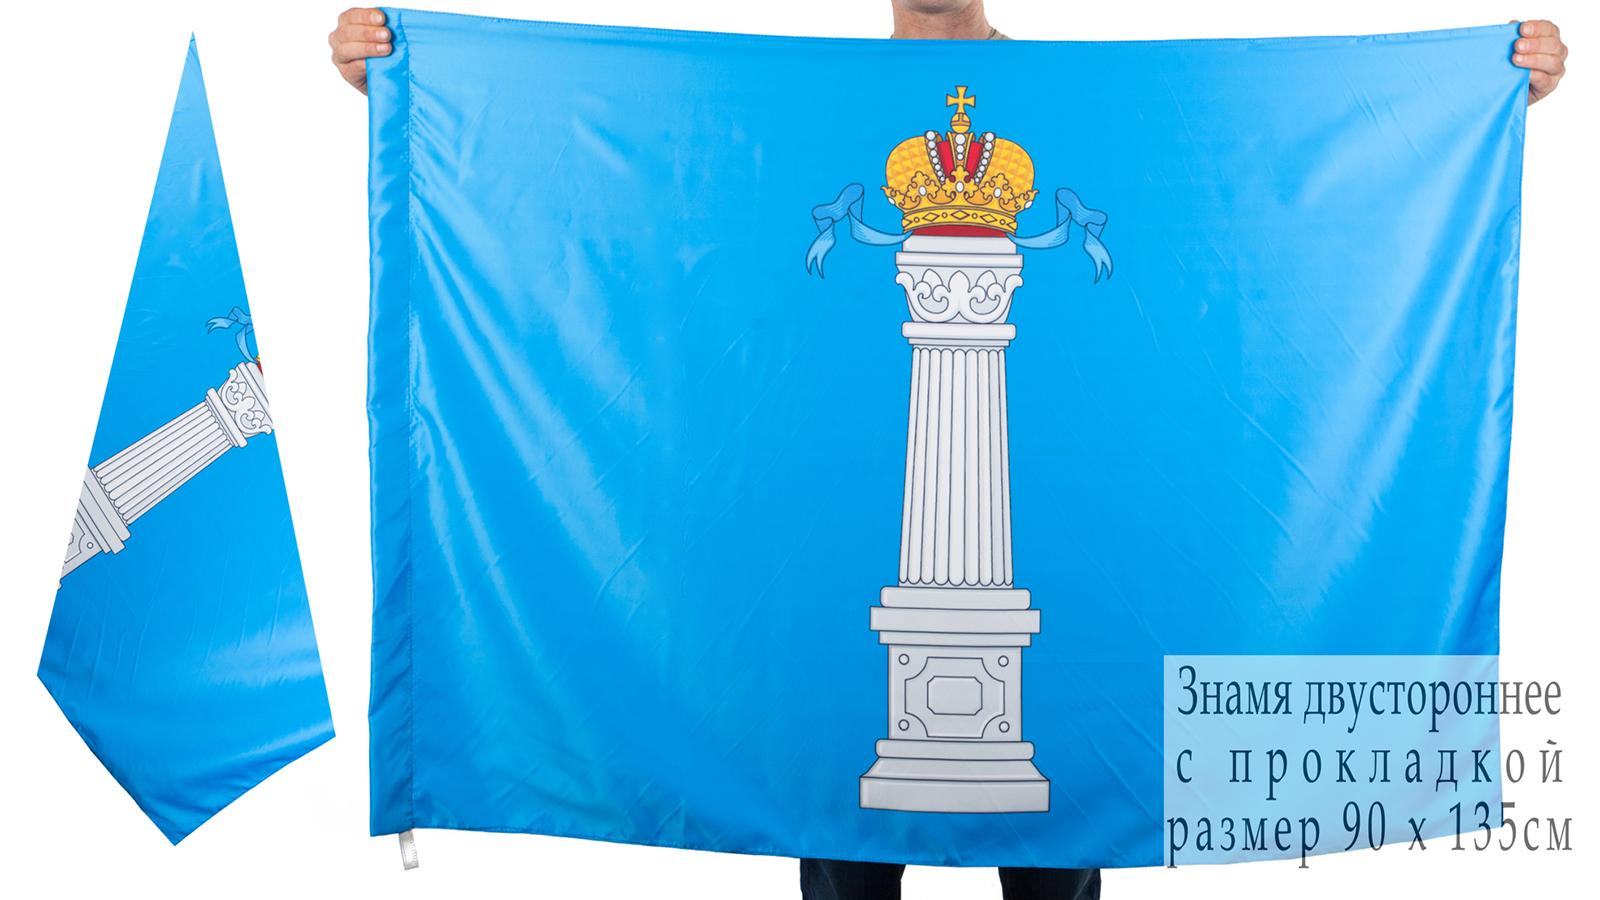 Двухсторонний флаг Ульяновской области